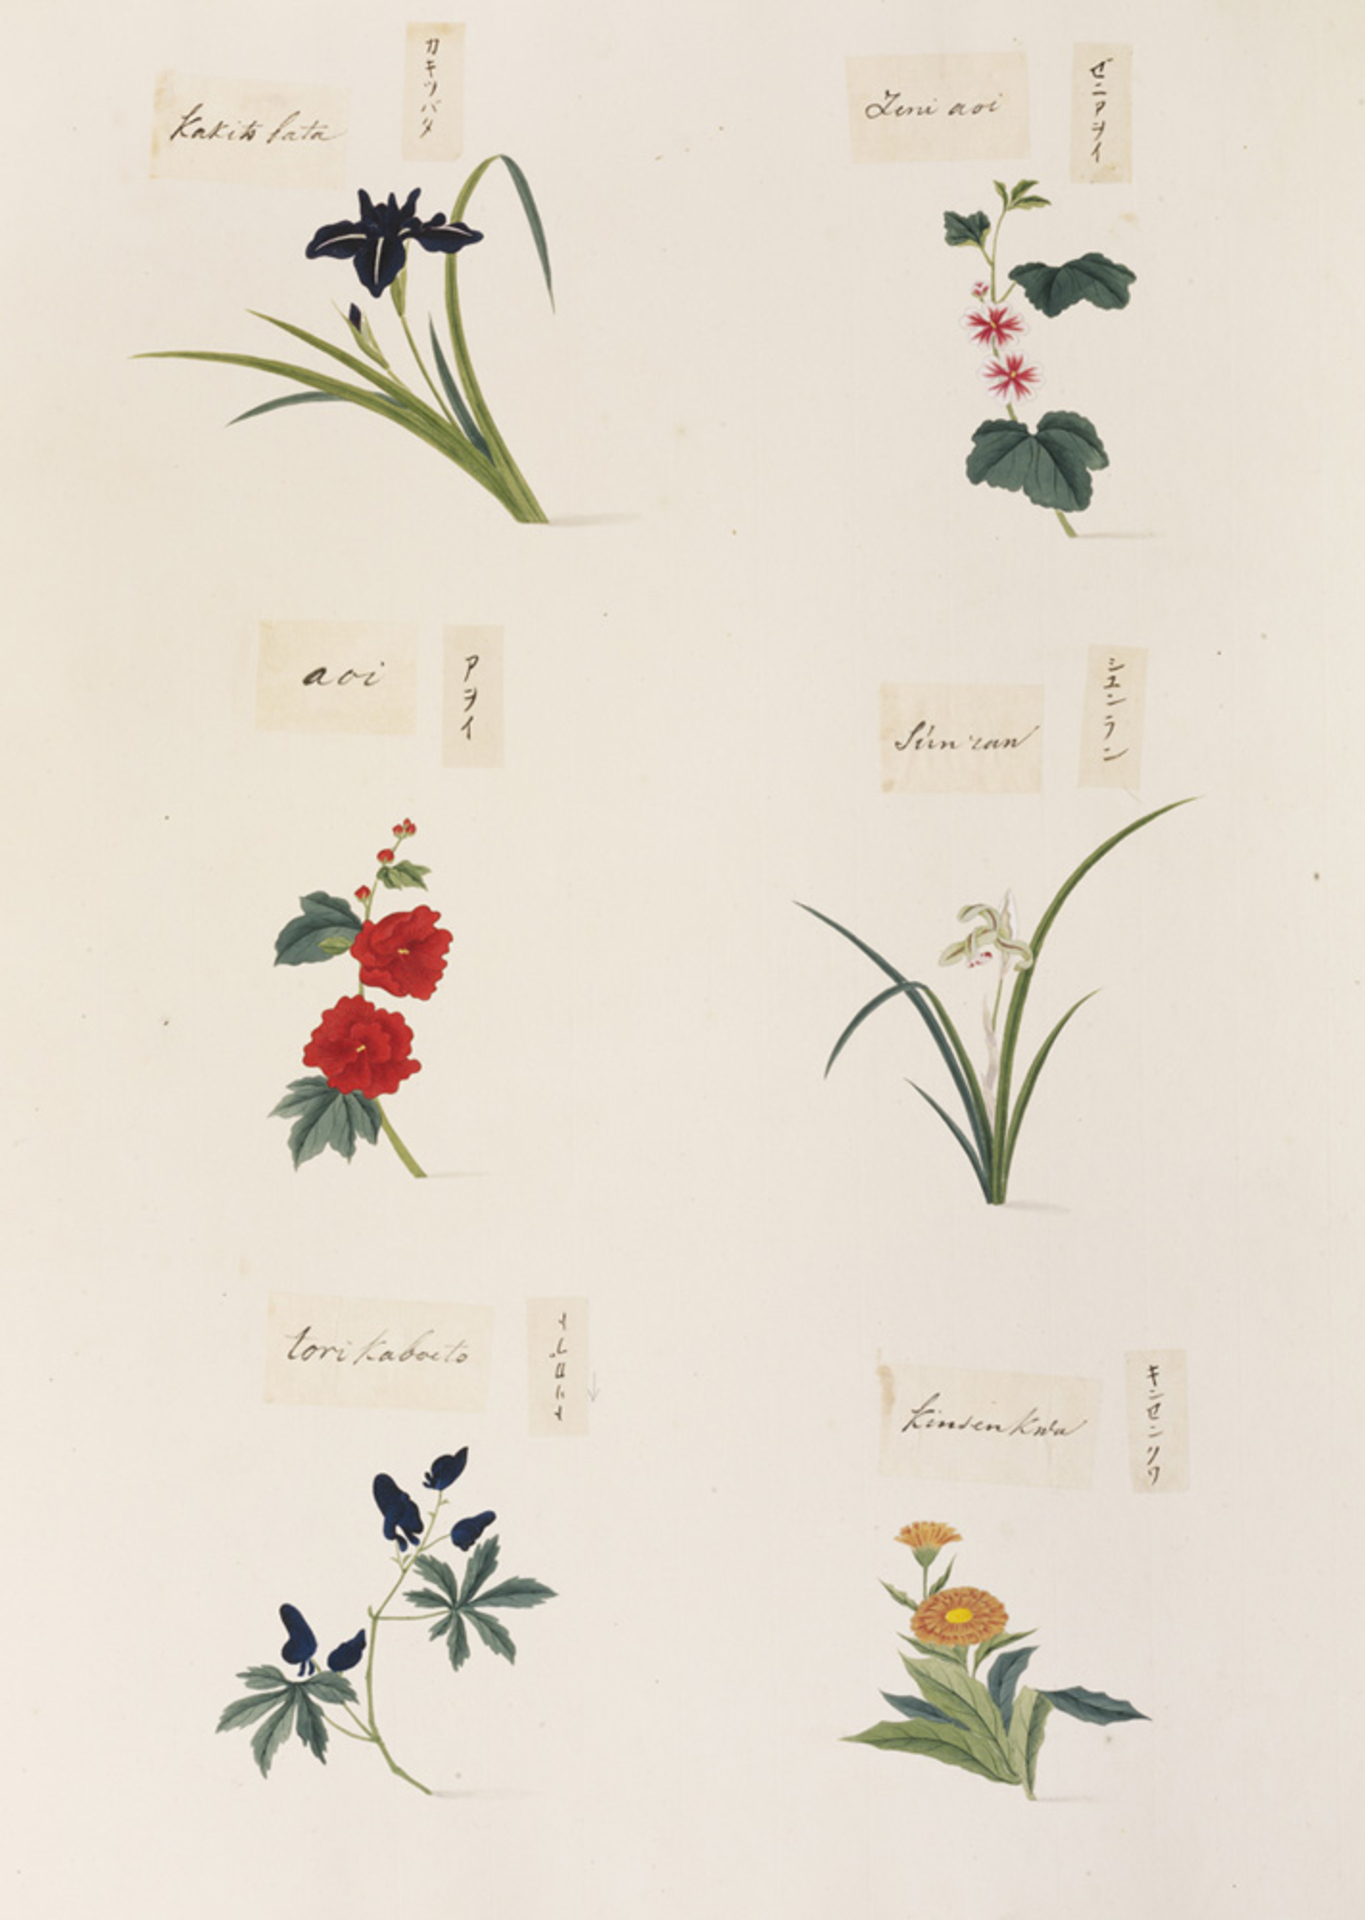 RMNH.ART.346 | Aconitum